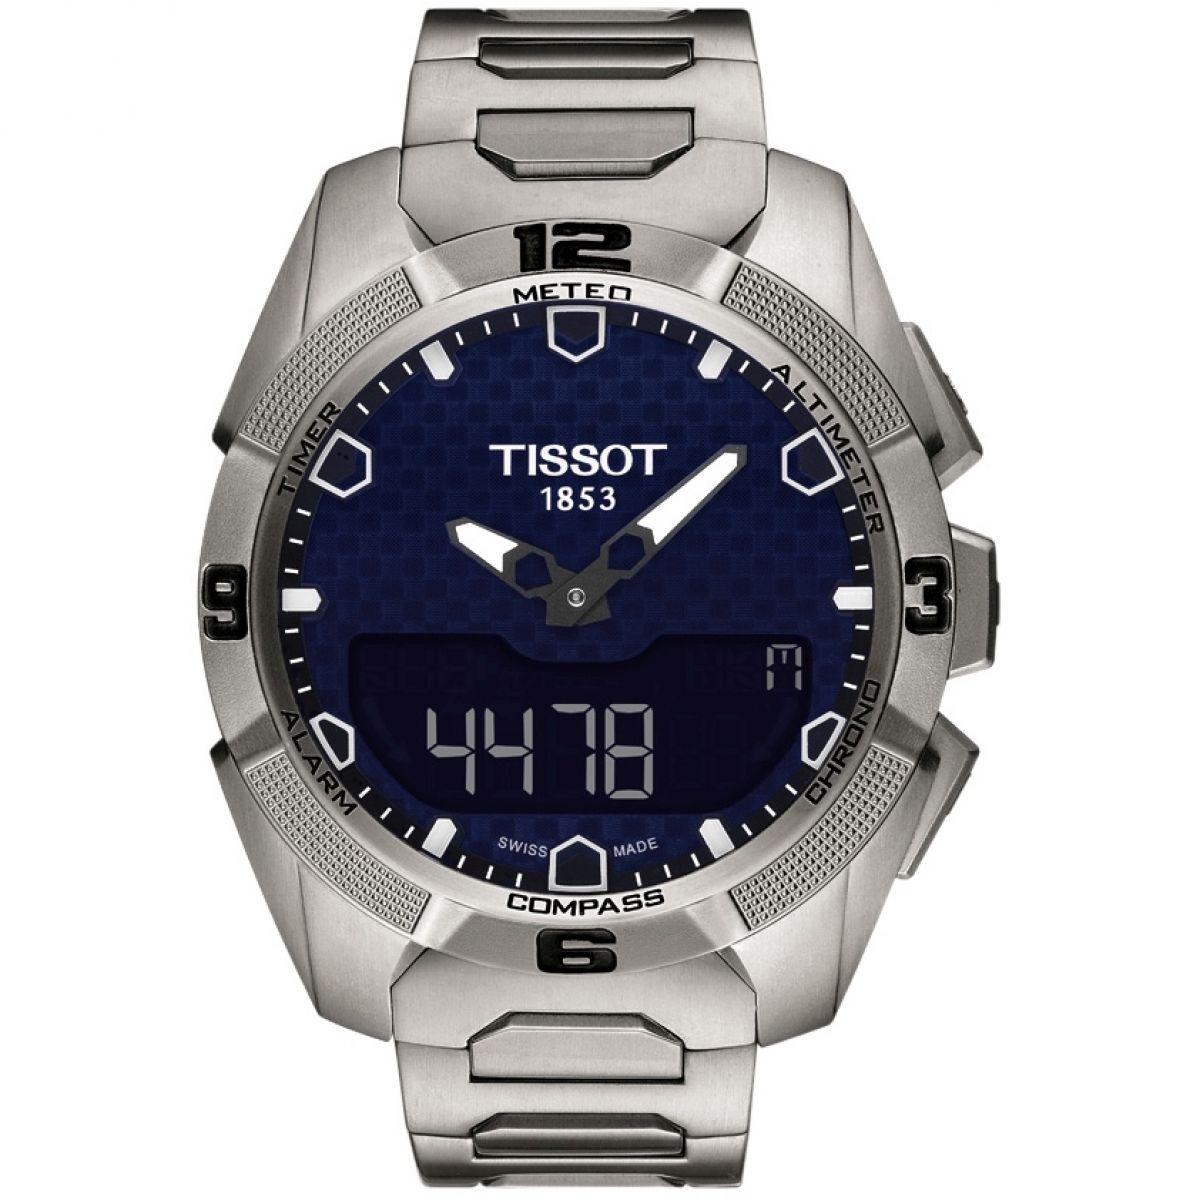 gents tissot t touch expert solar chronograph watch t0914204404100 rh watchshop com Tissot Z254 354 Tissot T-Touch Titanium Watch